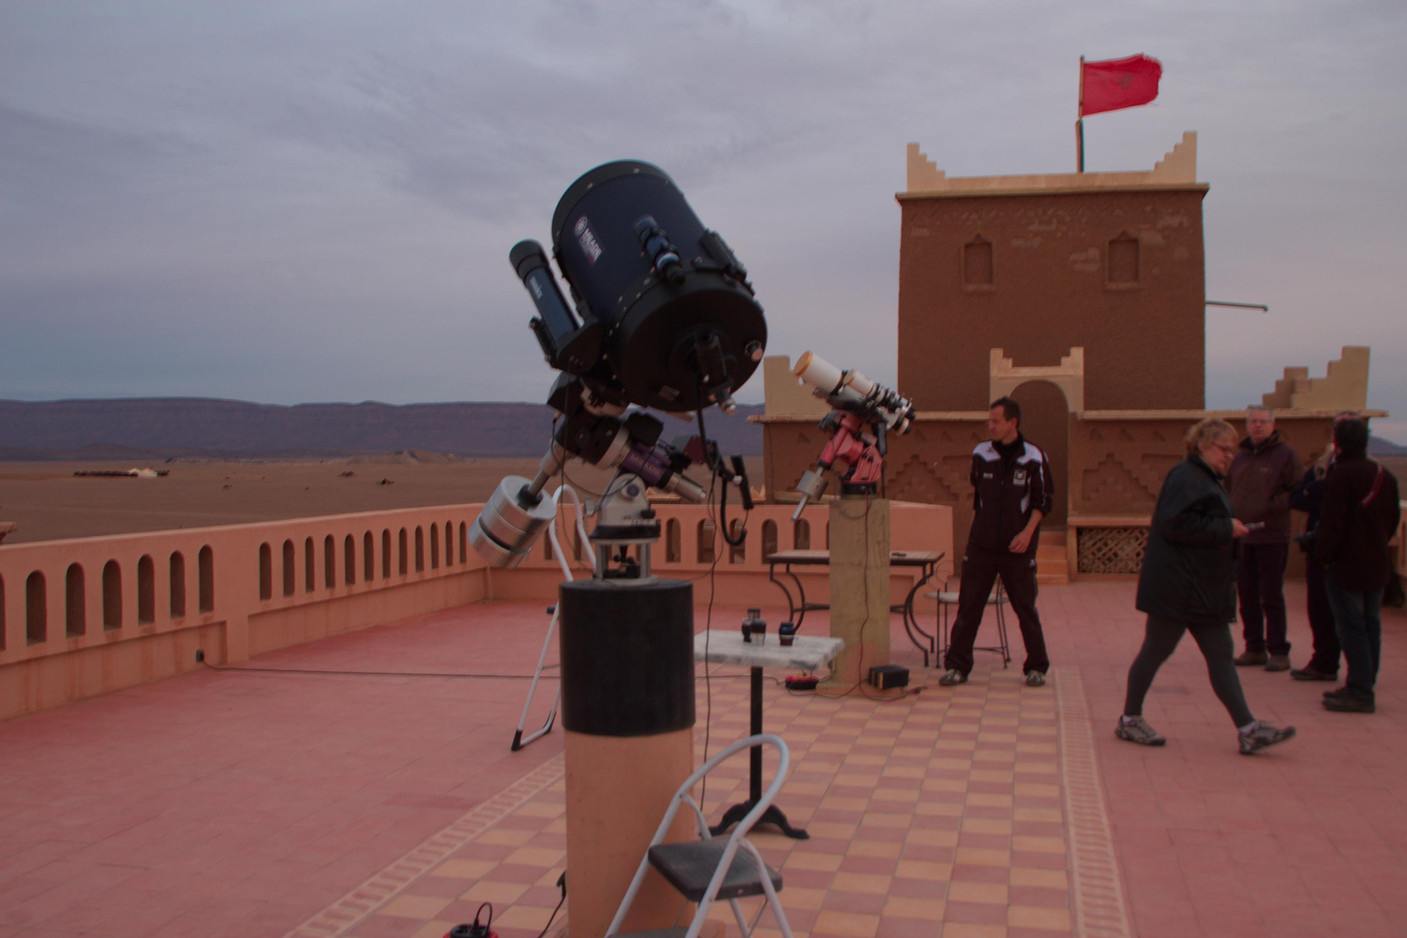 Morocco, Geminid Meteor Showers 2013